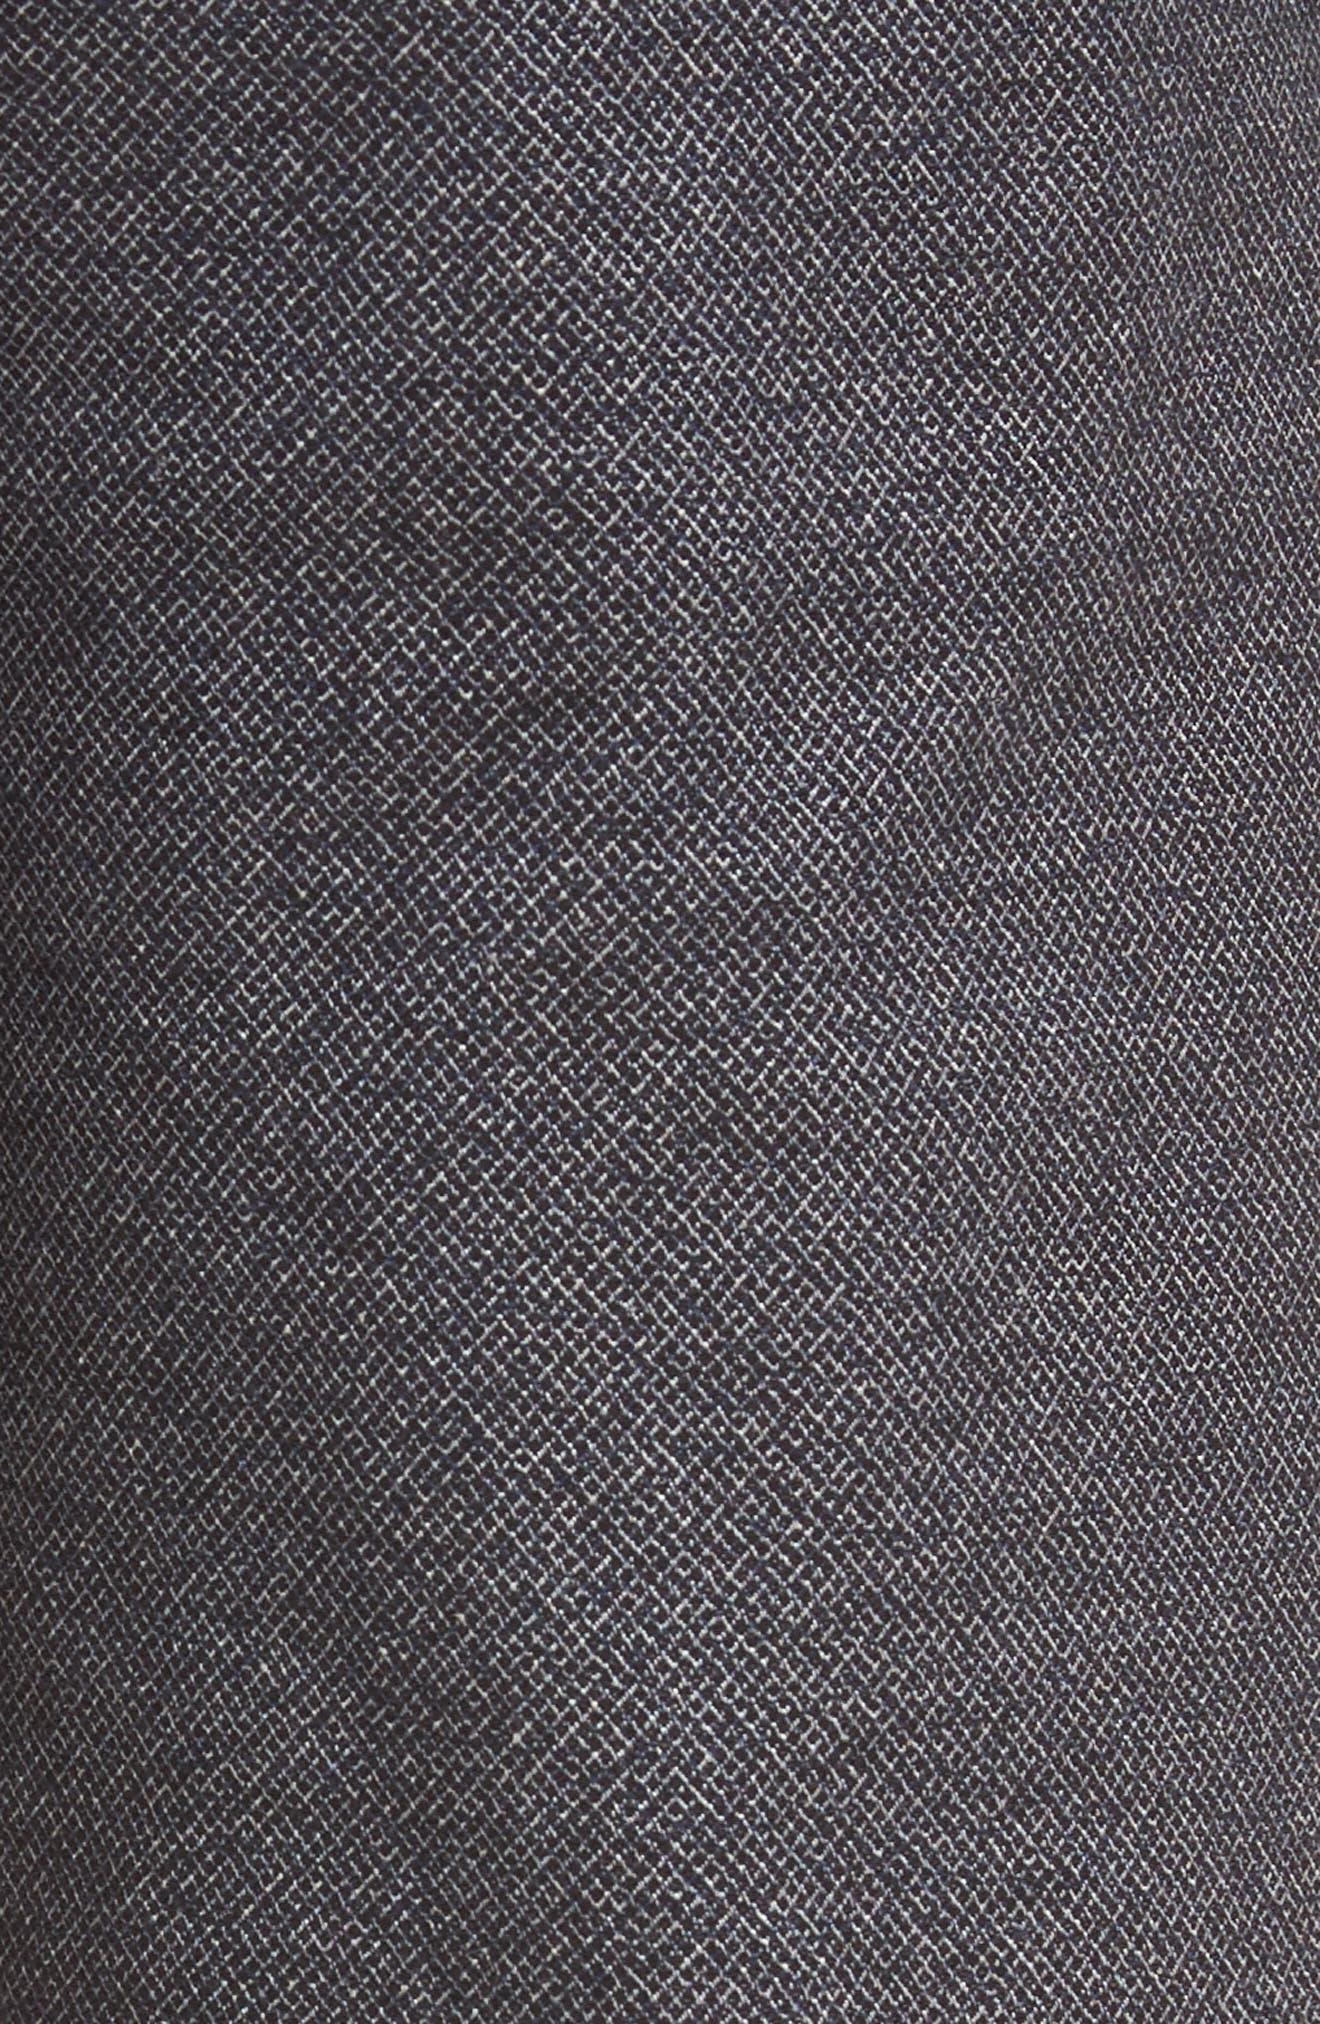 Pintz Slim Fit Trousers,                             Alternate thumbnail 5, color,                             Navy